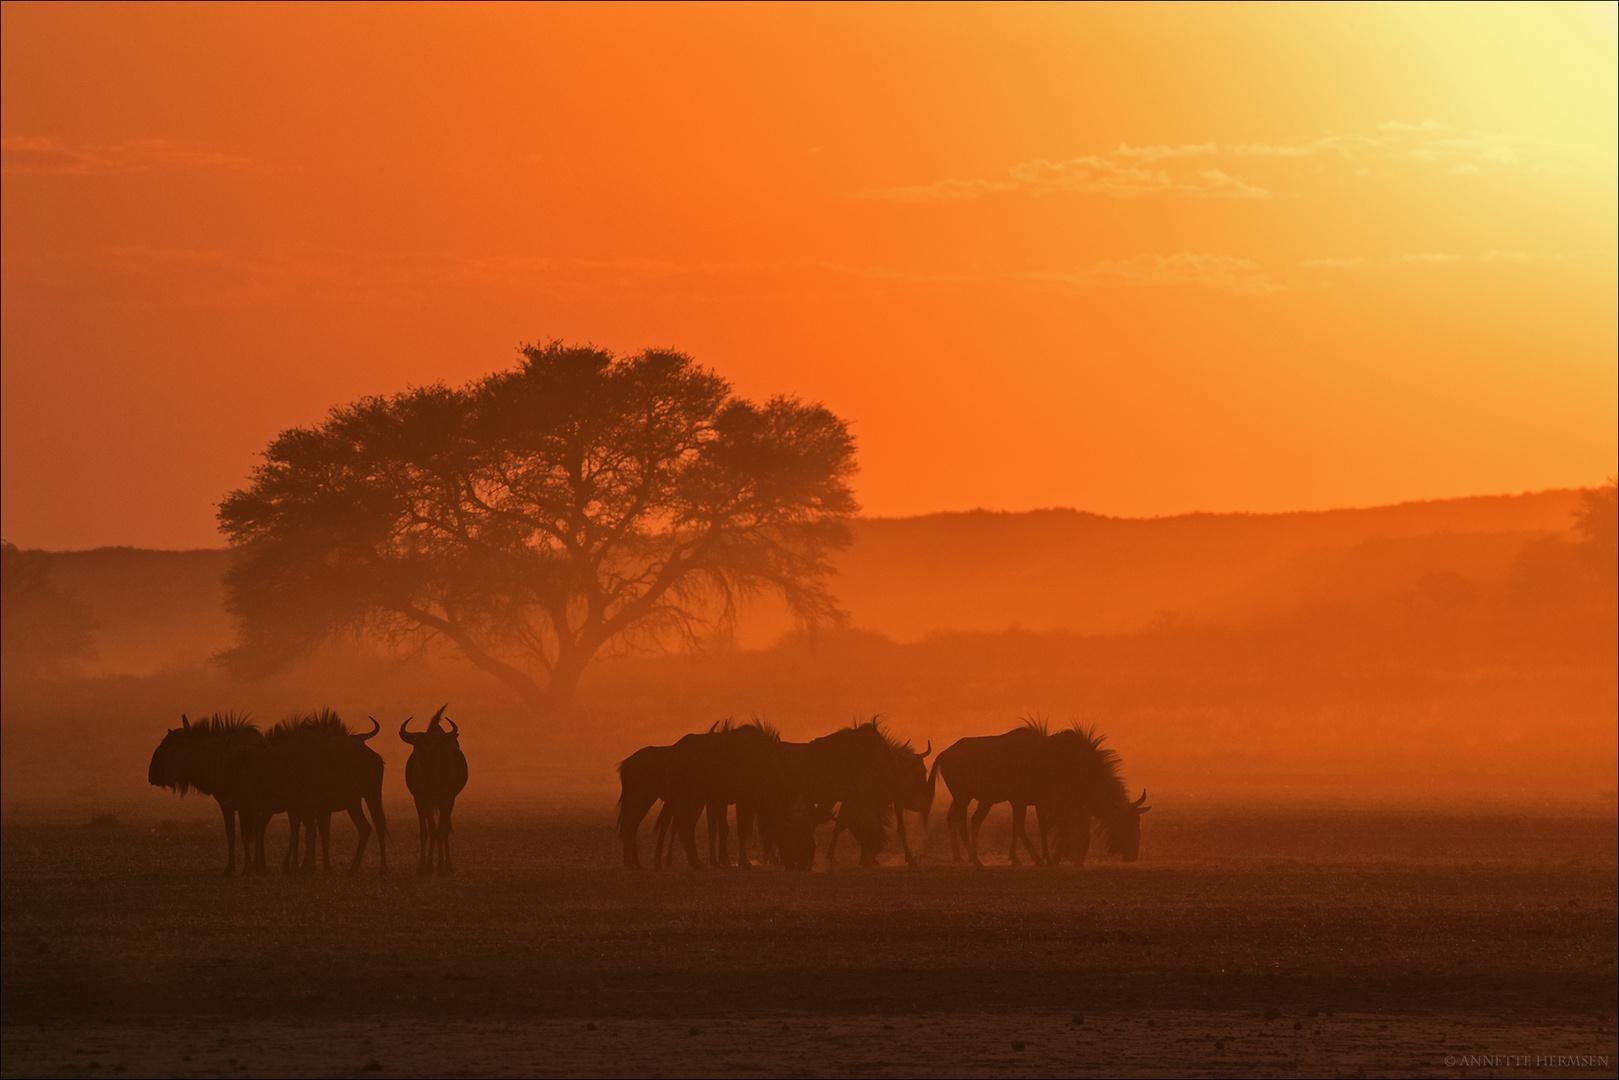 Mein Roadmovie [70] - African Morning